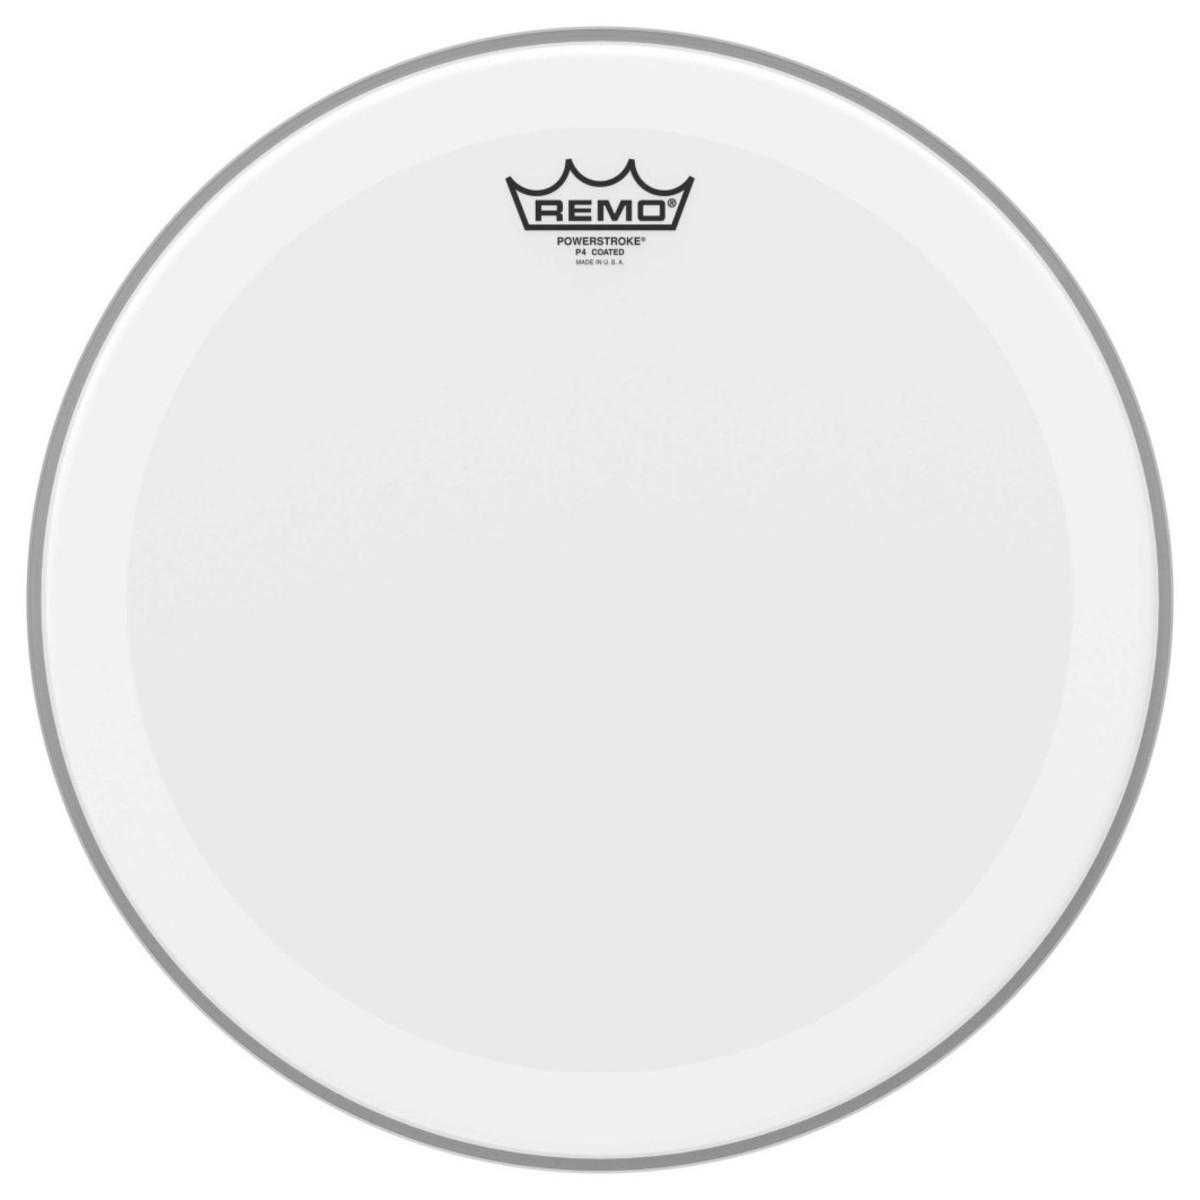 Remo Powerstroke 4 Coated 16 Drum Head